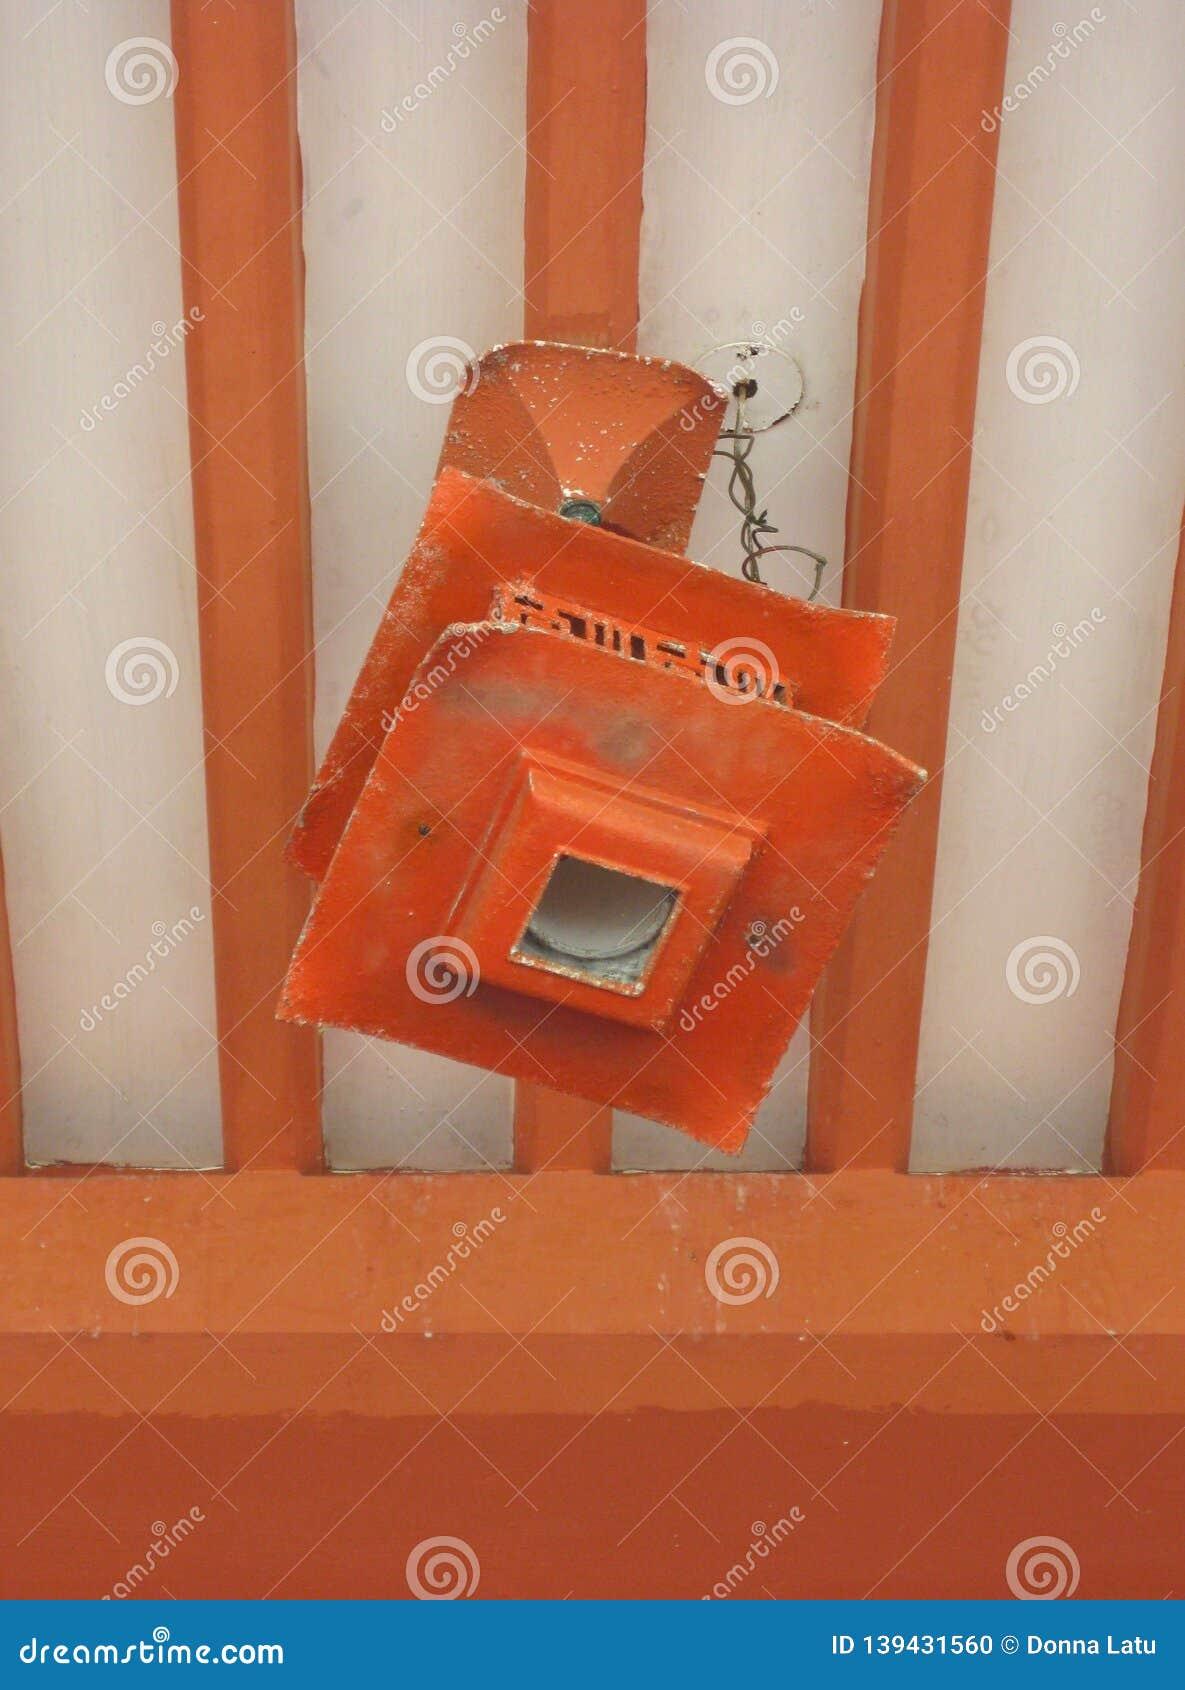 Rustic Japanese lantern hanging from exposed beams